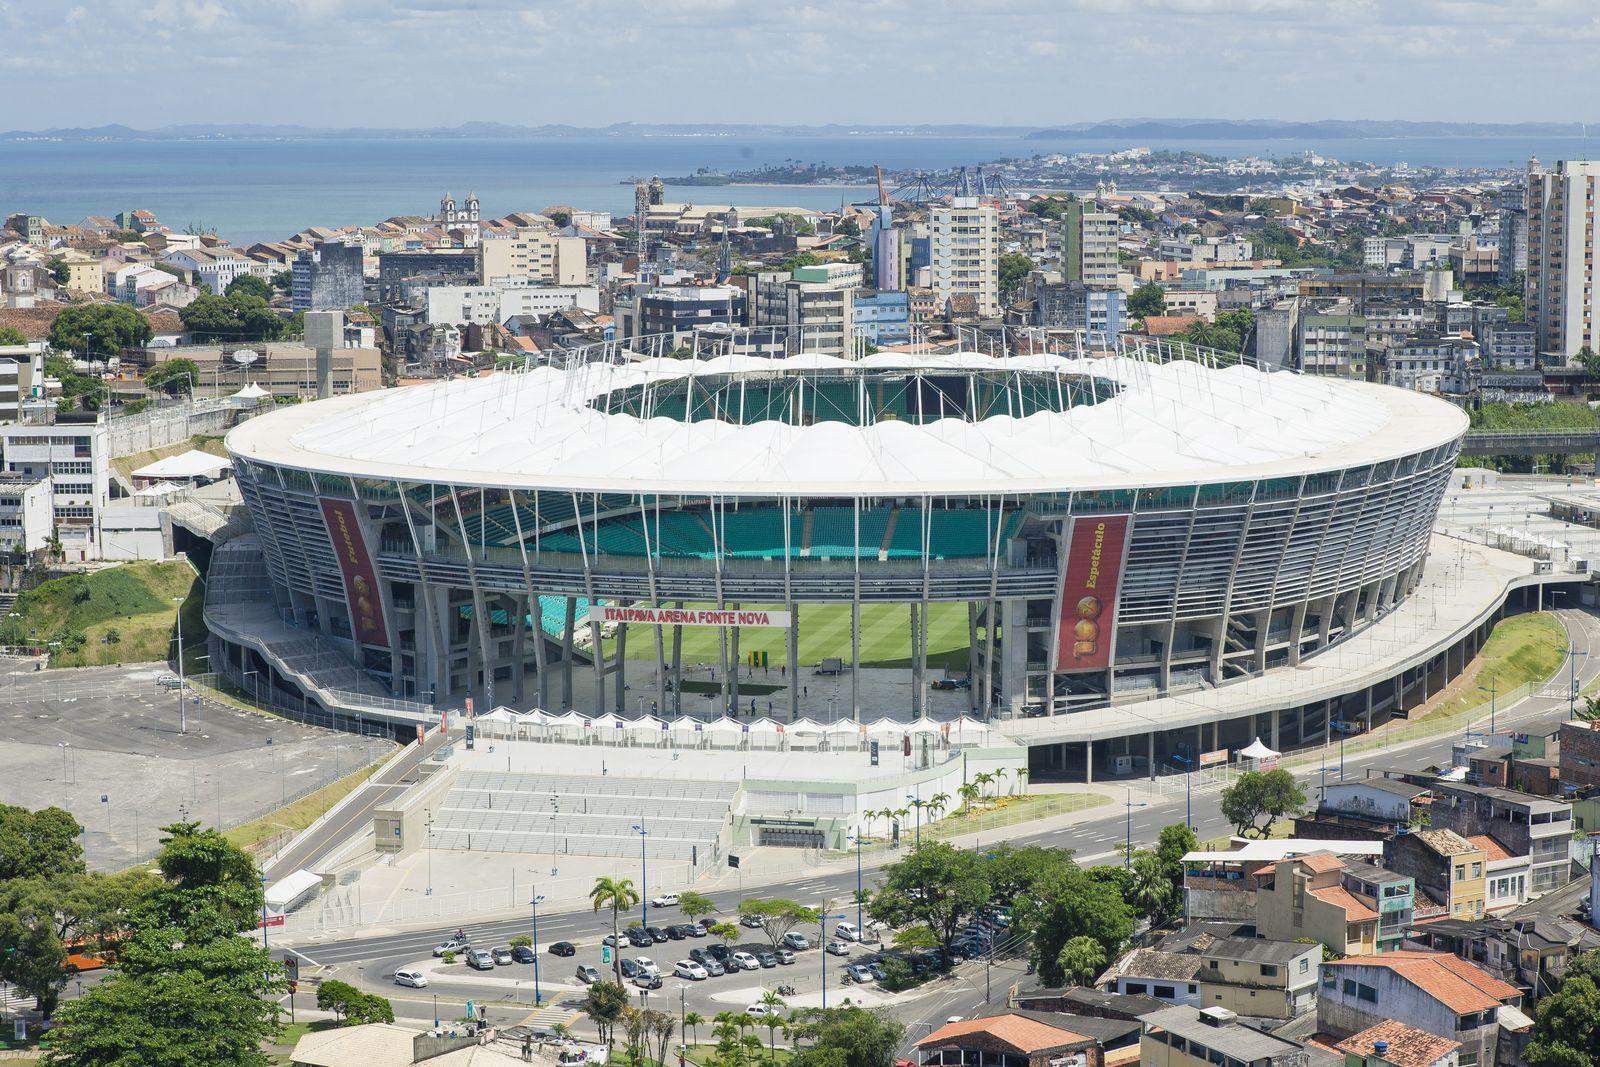 Itaipava Arena Fonte Nova, Salvador, Brasil - Shulitz/Tetra